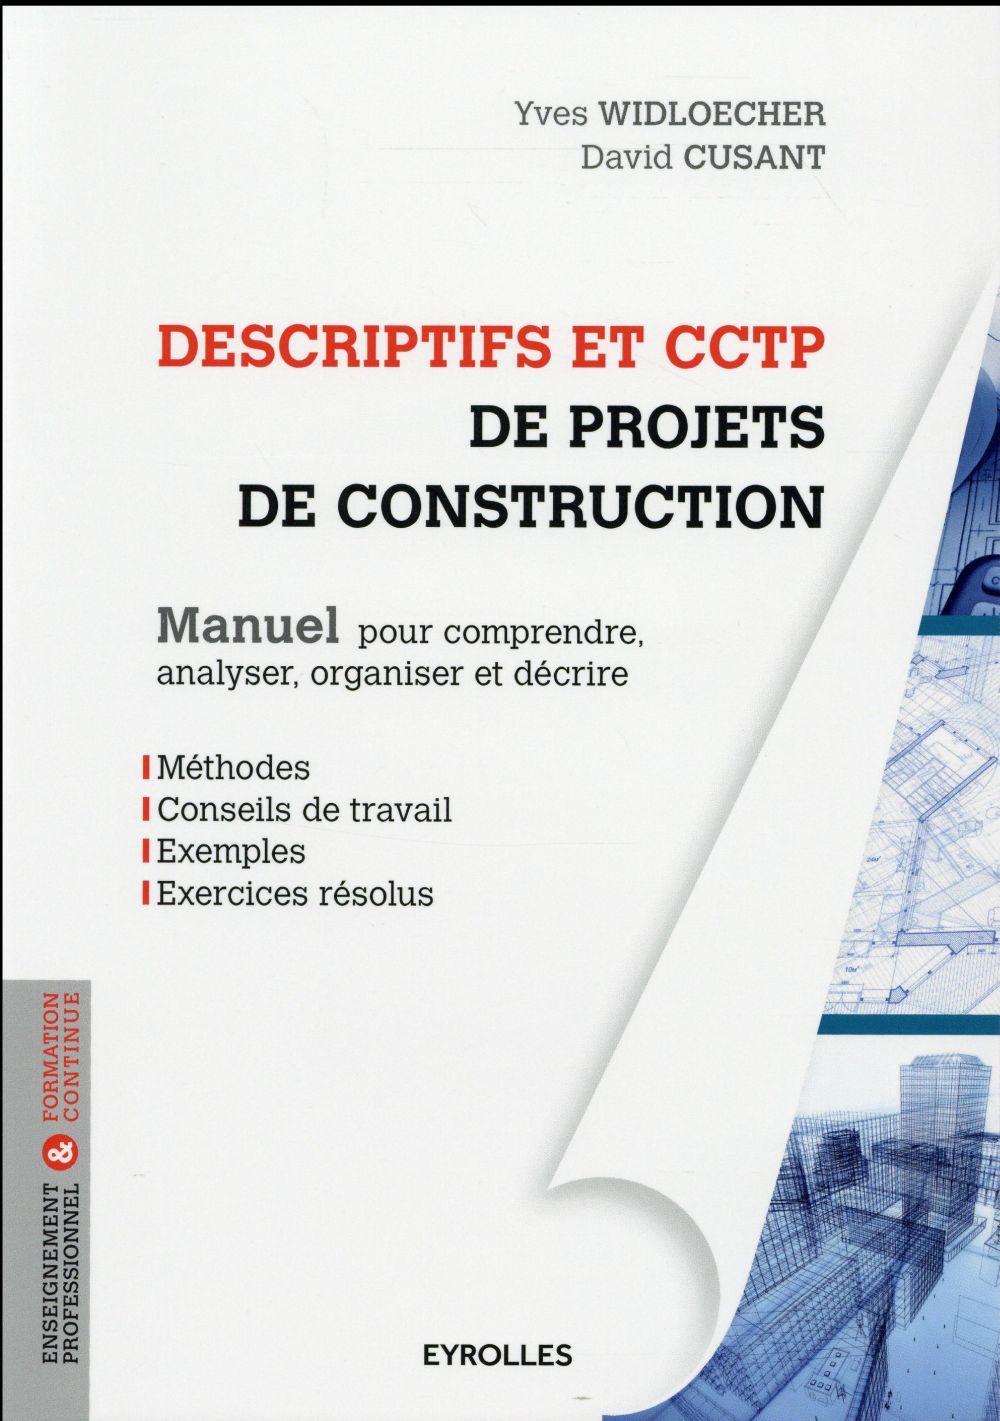 Peinture Plafond Salle De Bain Mr Bricolage ~ Yves Widloecher David Cusant Belgique Loisirs Of Cctp Construction